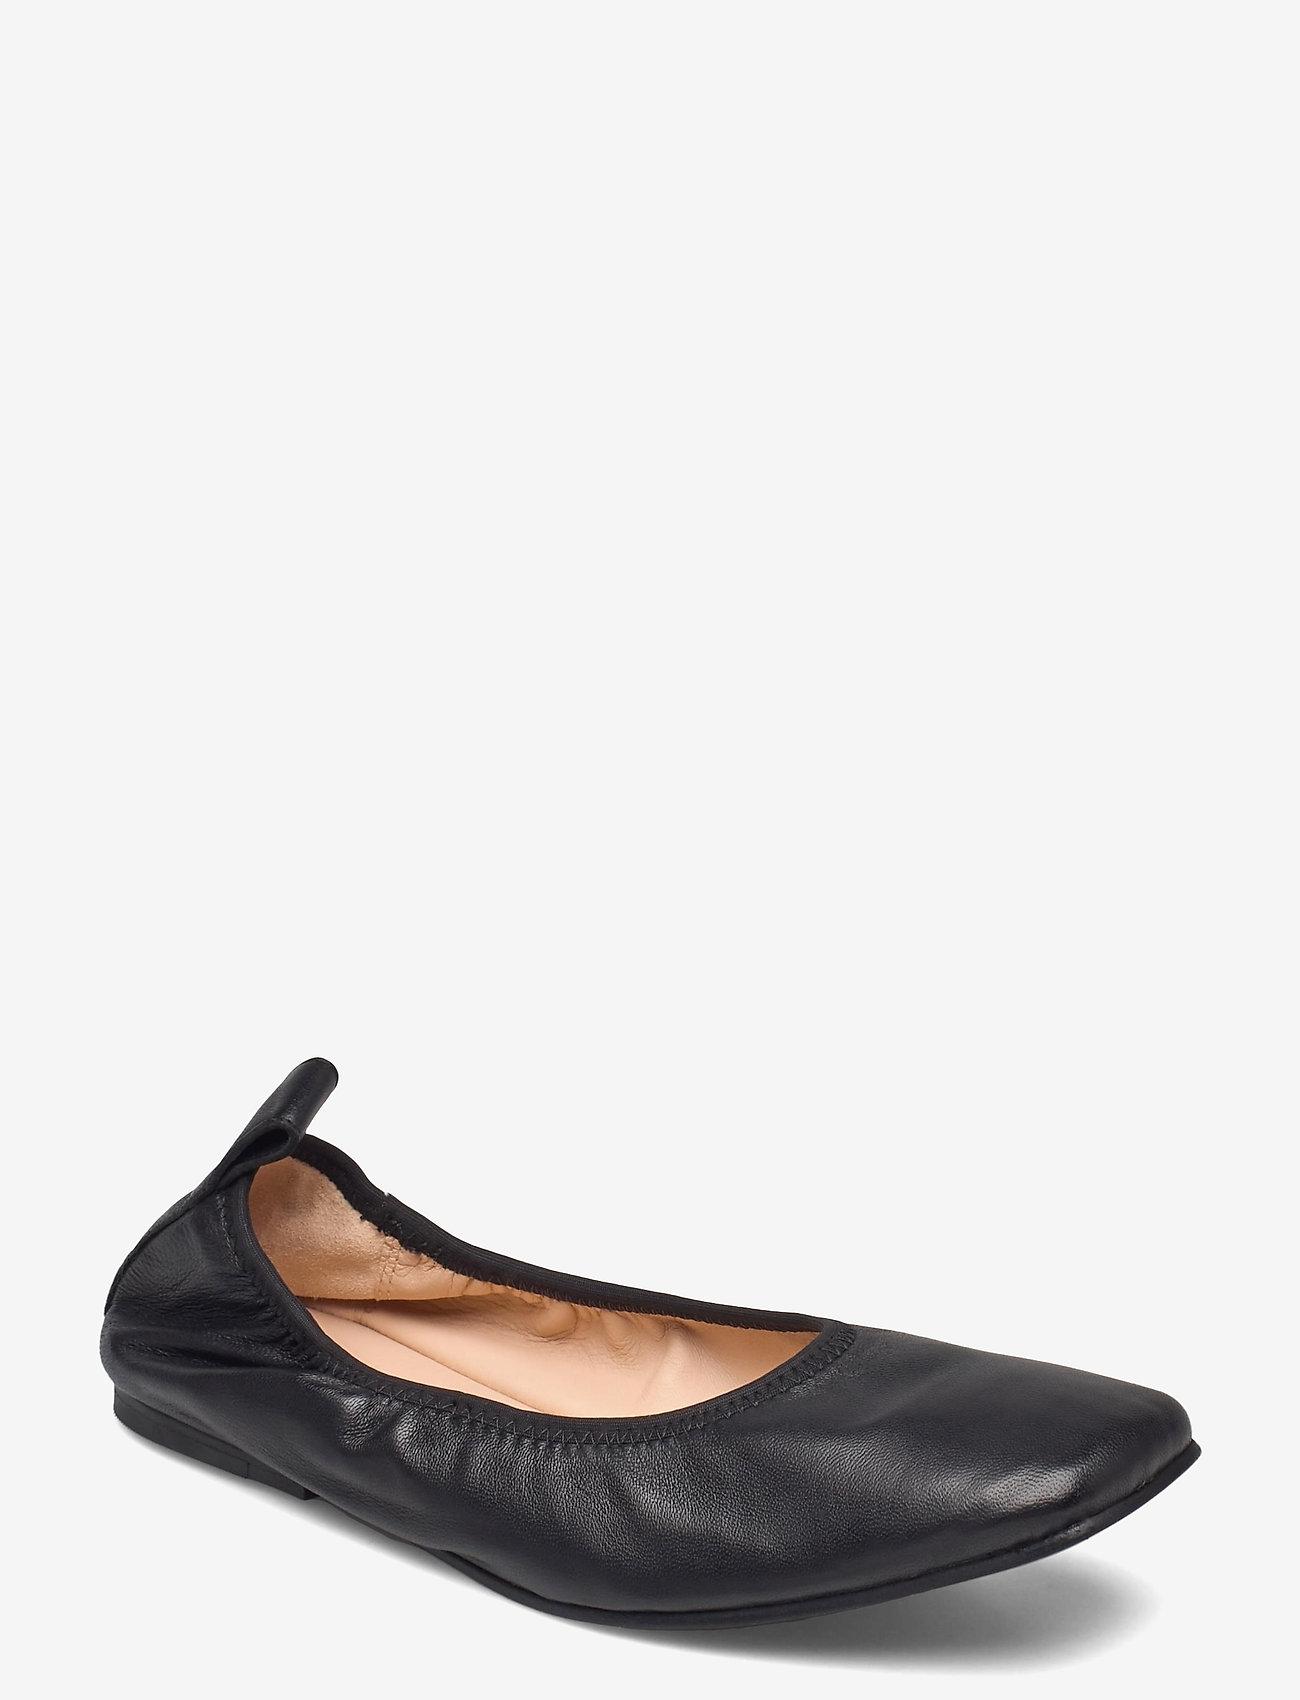 Clarks - Pure Ballet - ballerinas - black leather - 0